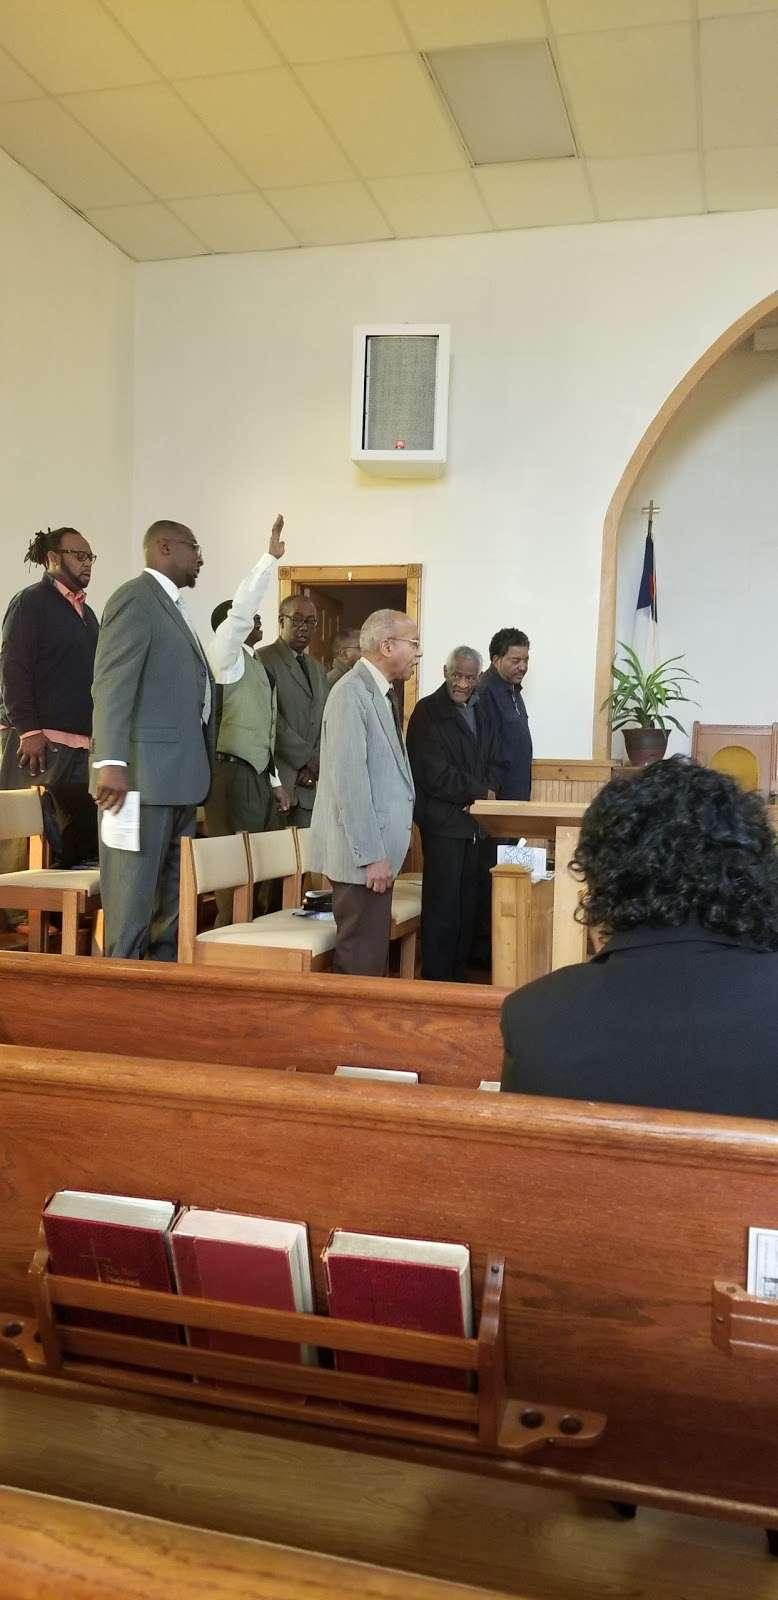 Flat Rock Baptist Church - church    Photo 2 of 2   Address: 111 Carver St, York, SC 29745, USA   Phone: (803) 222-4517